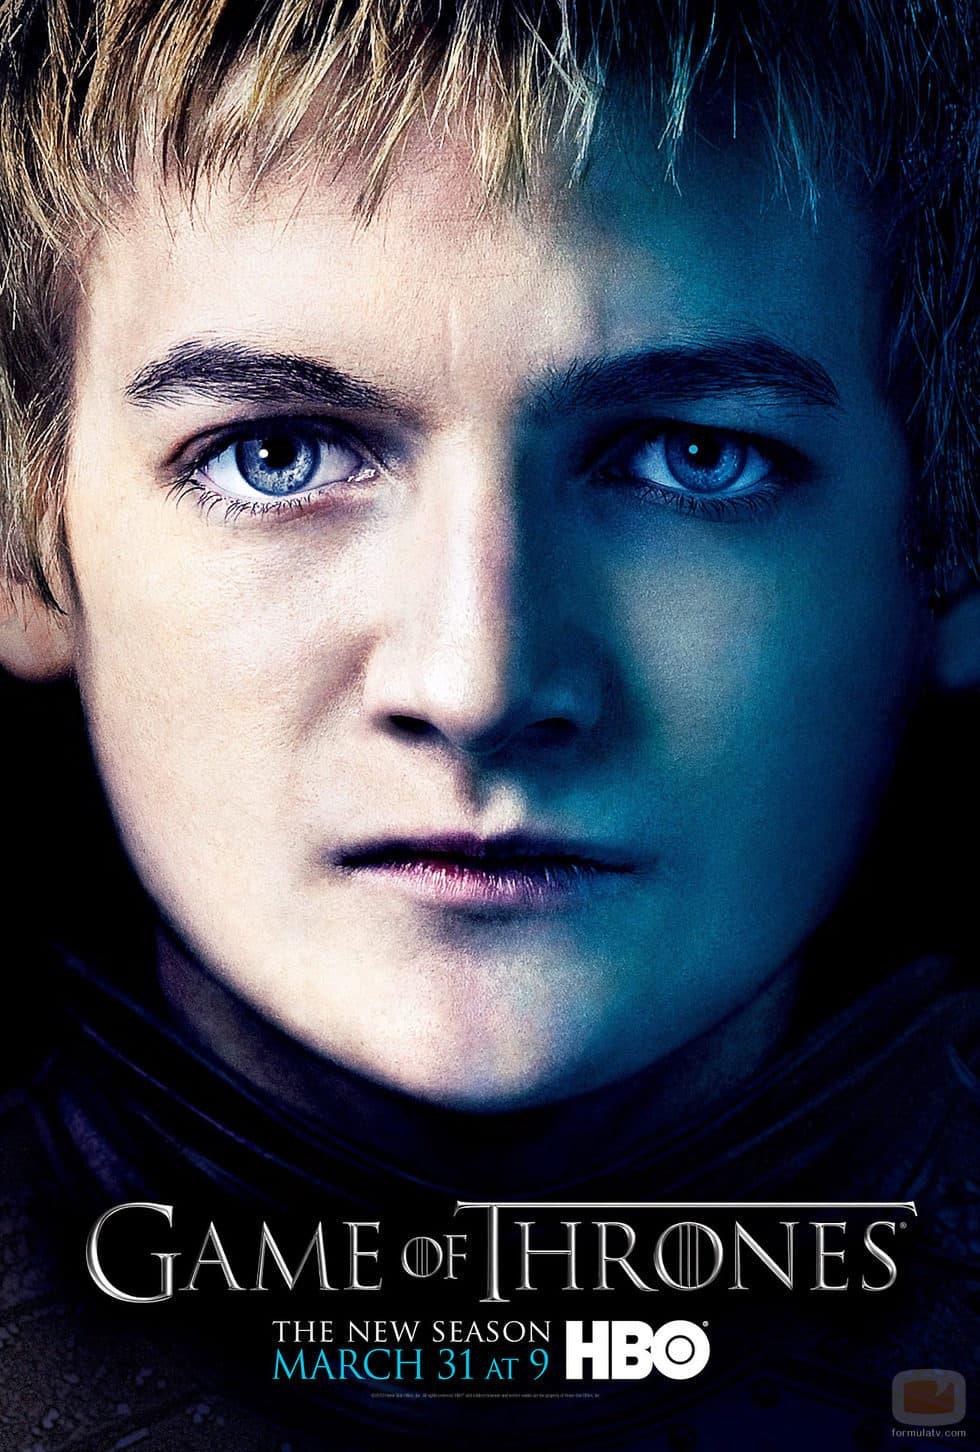 joffrey-lannister-poster-promocional-tercera-temporada-juego-de-tronos